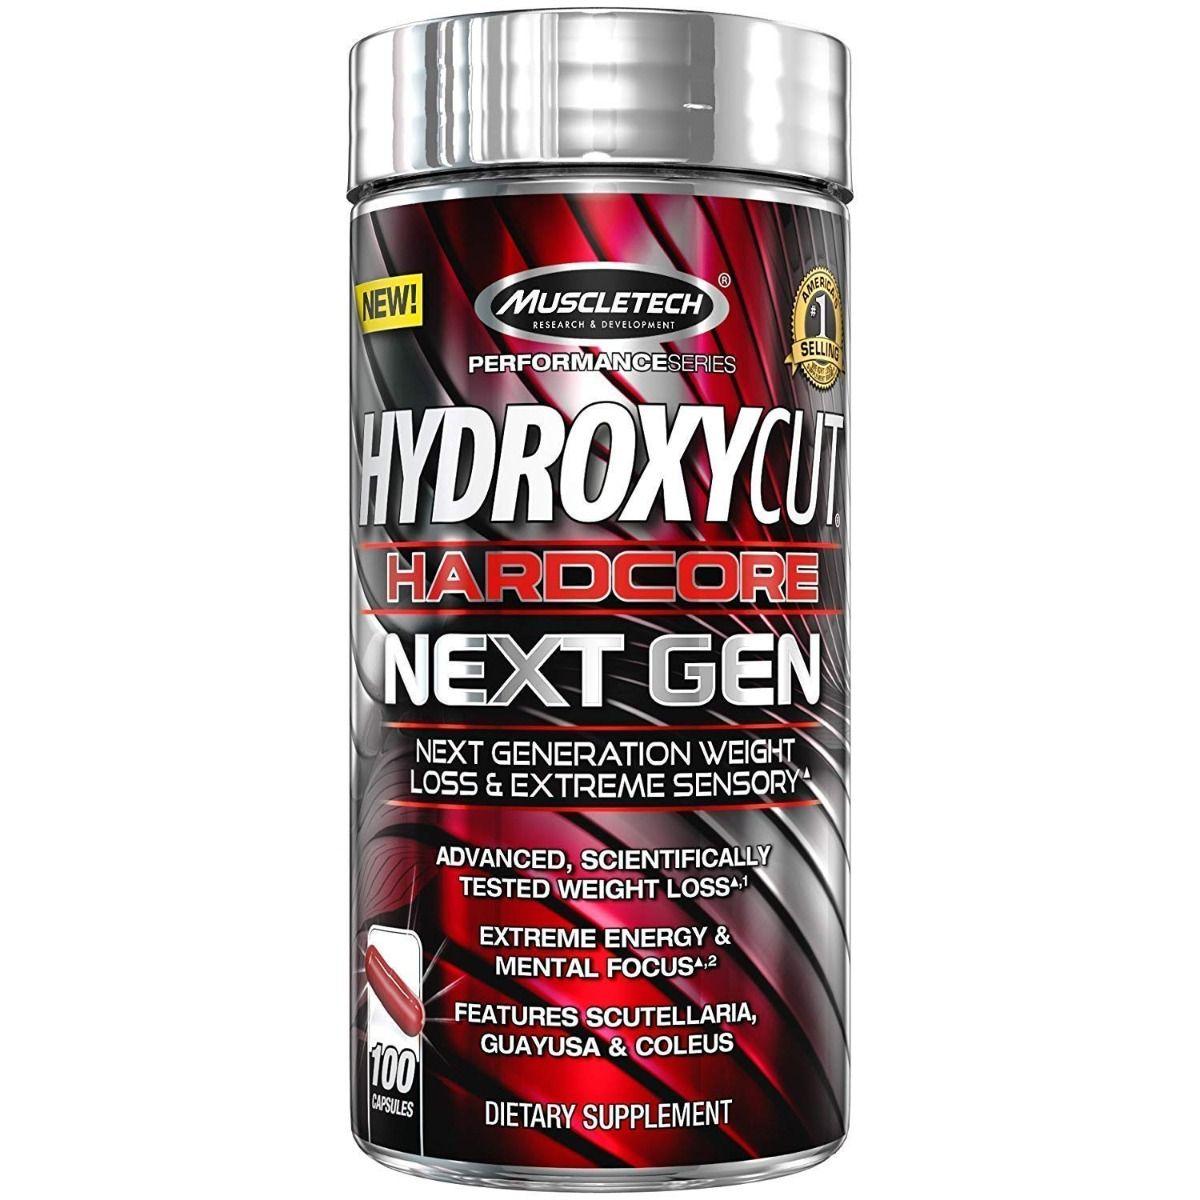 Muscletech Hydroxycut Hardcore Next Gen, 100 Capsules